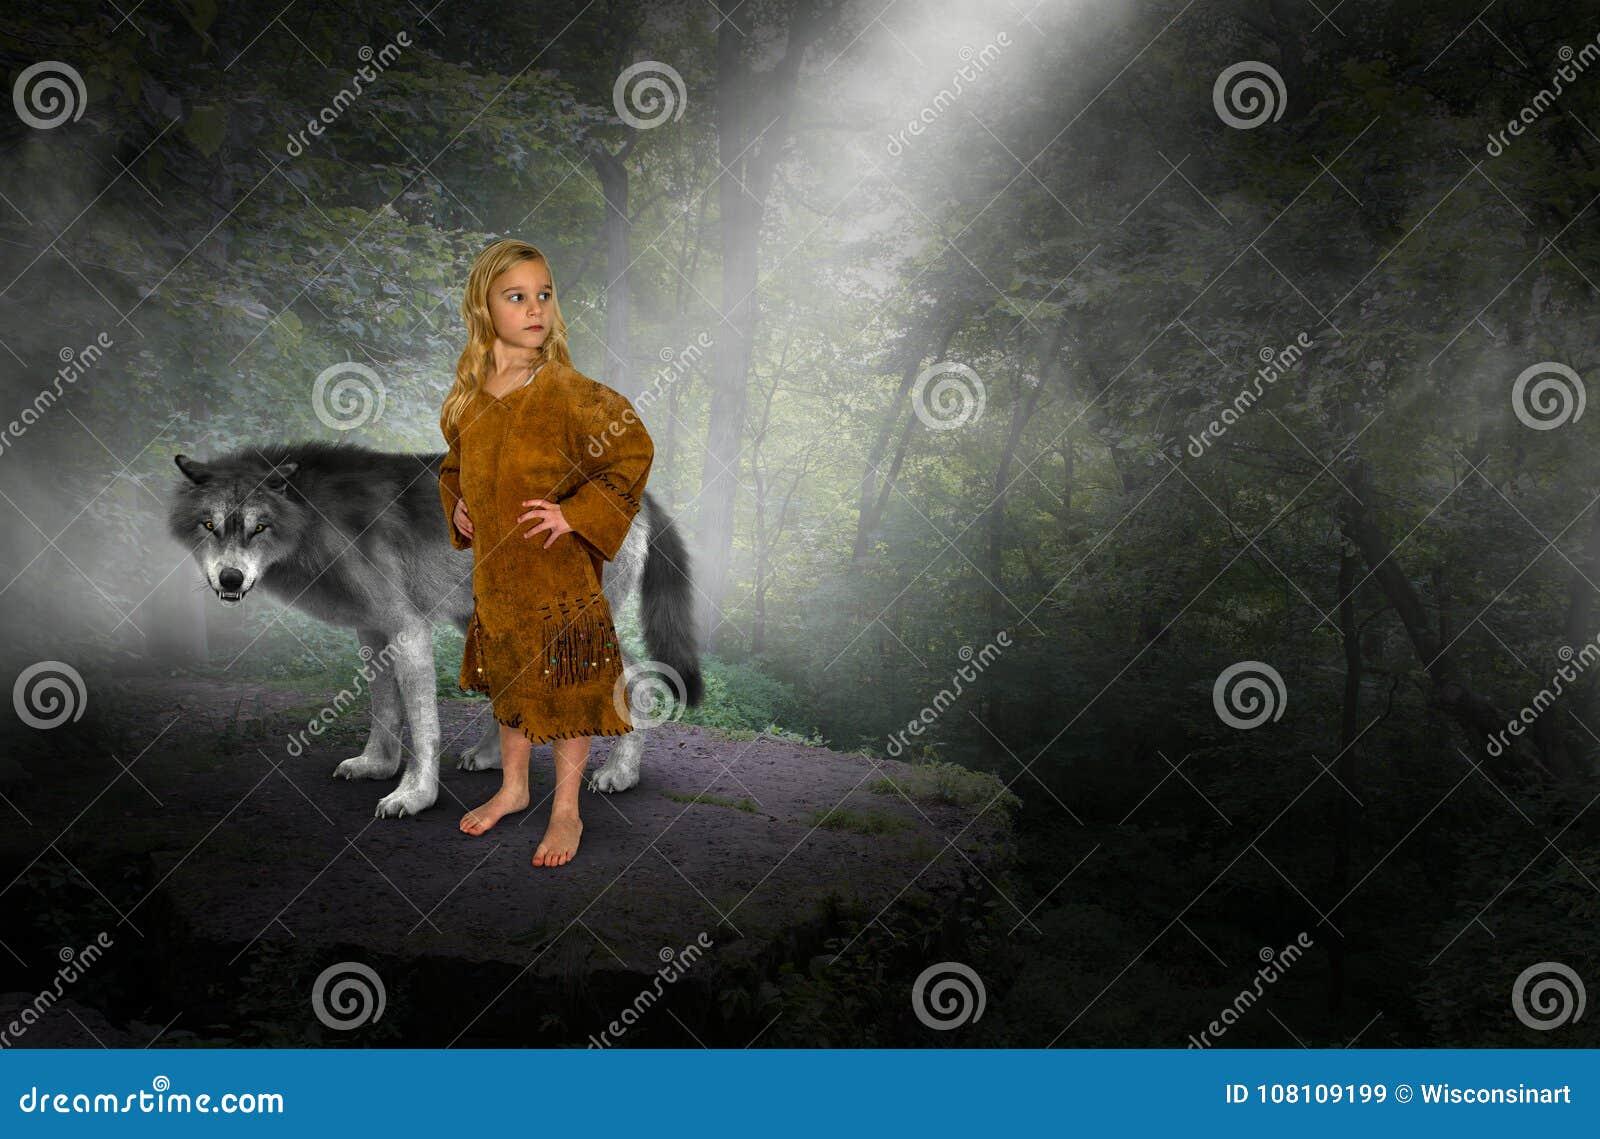 Young Girl, Indian Princess, Wolf